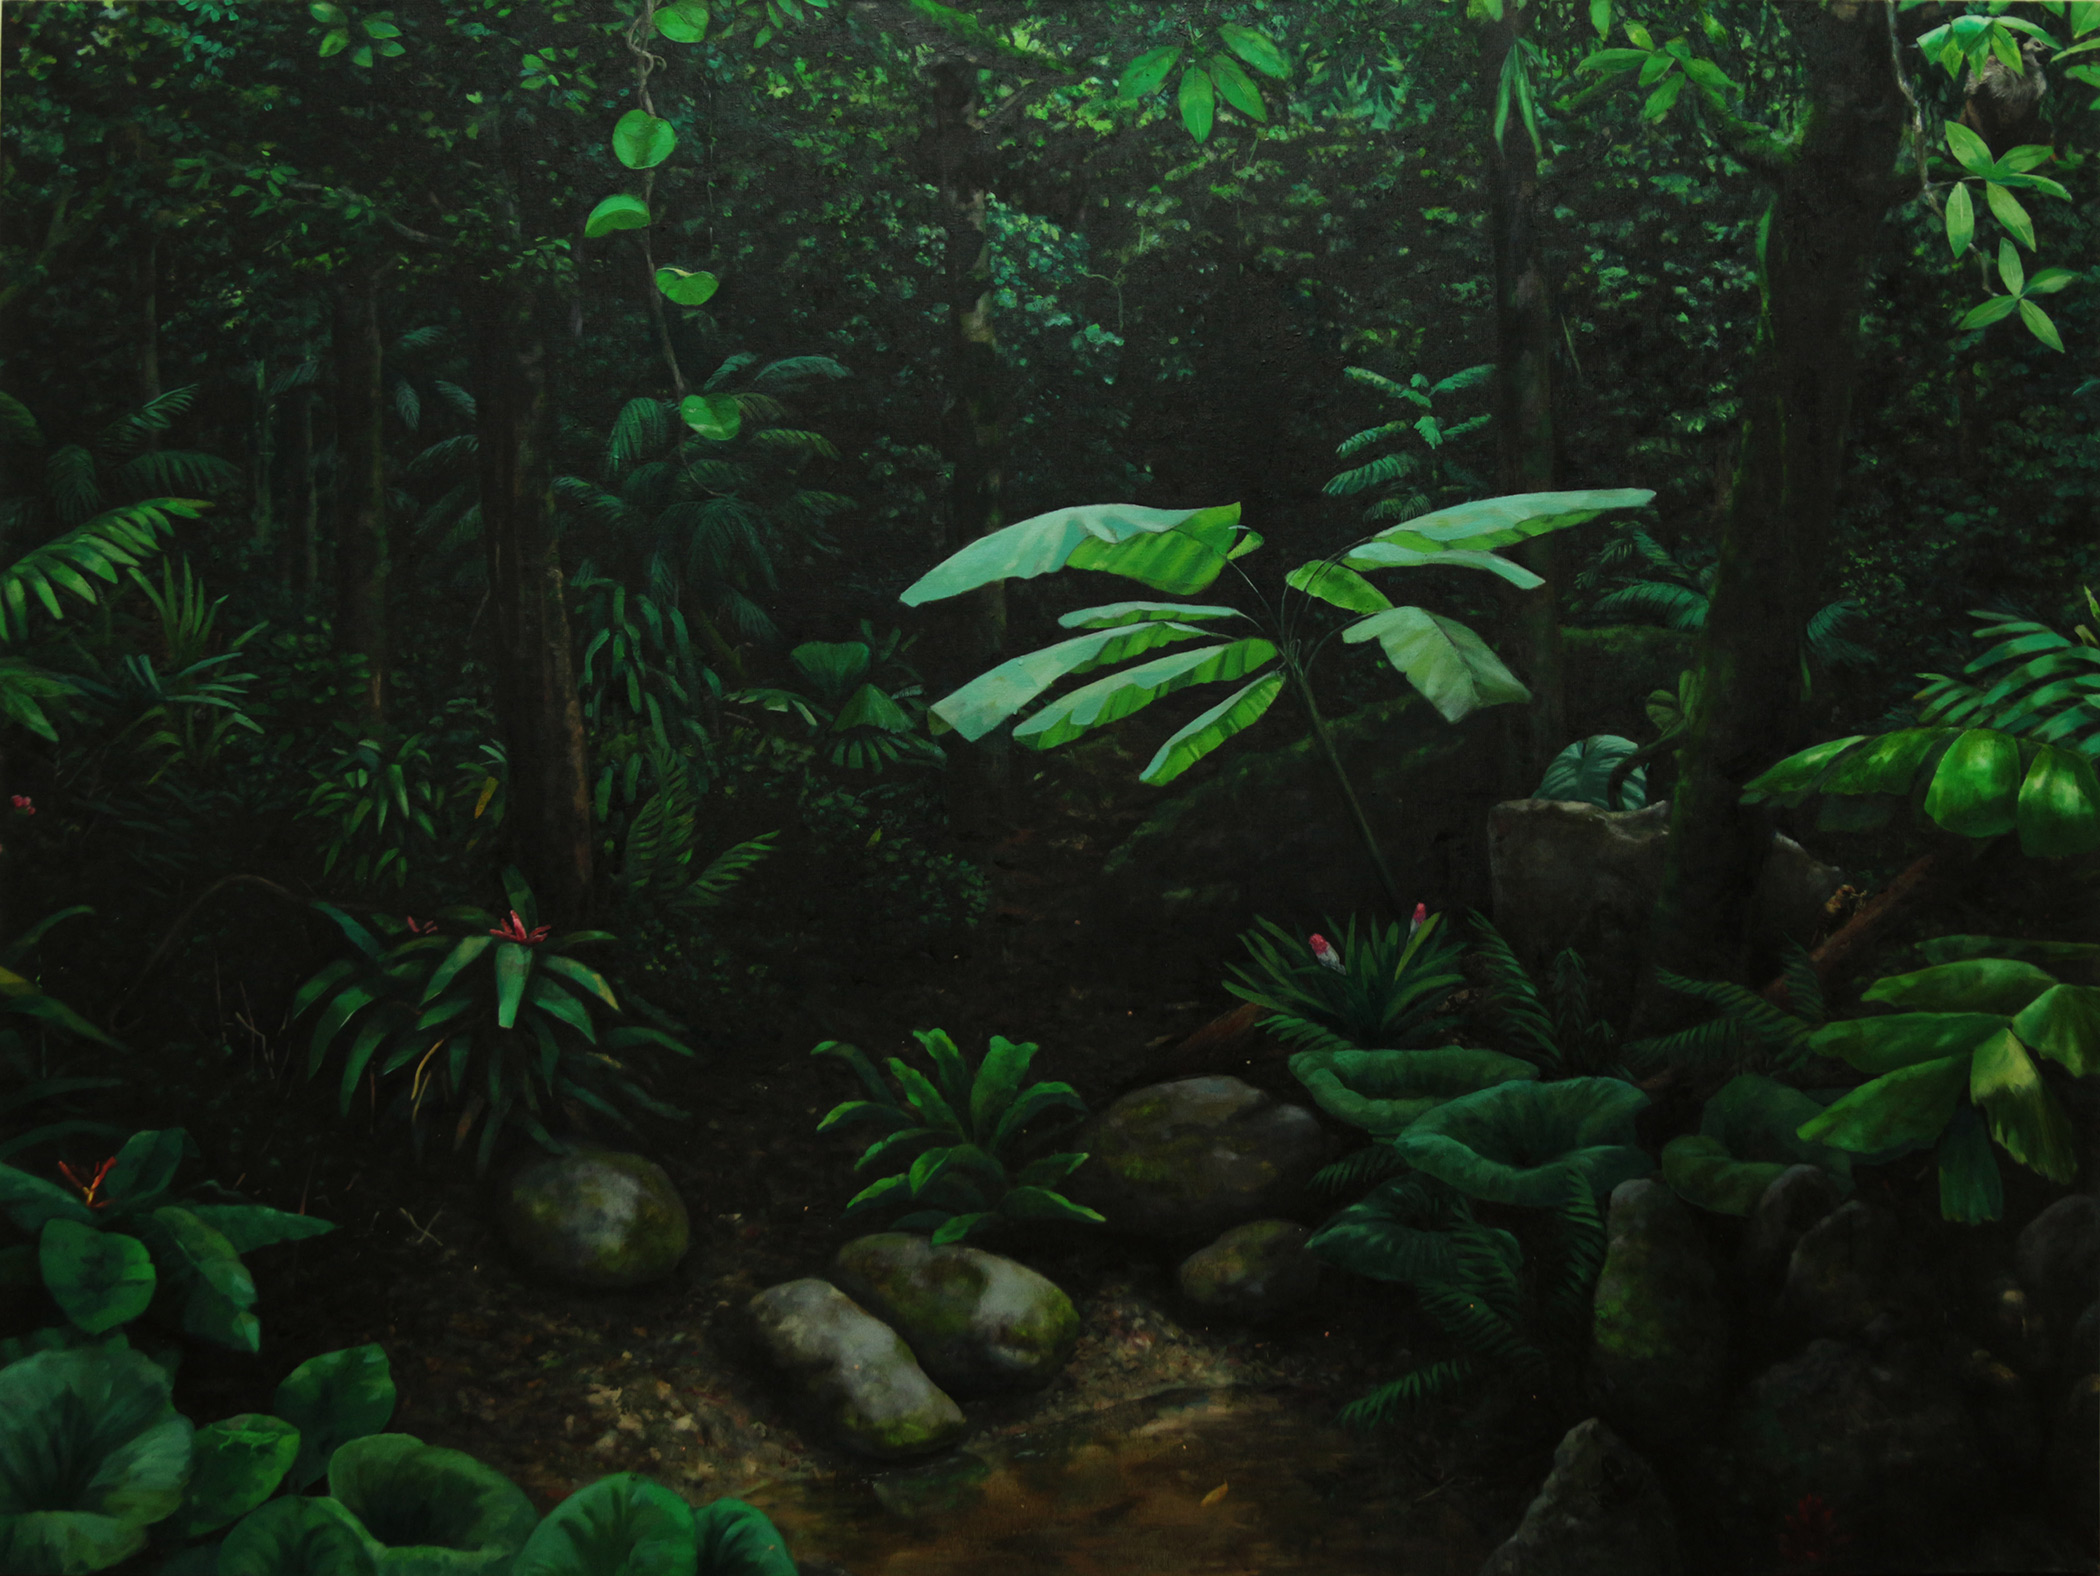 Sebastijan-Dračić,-_The-universe-is-indifferent_,-200x150-cm,-ulje-na-platnu_oil-on-canvas,-2017.